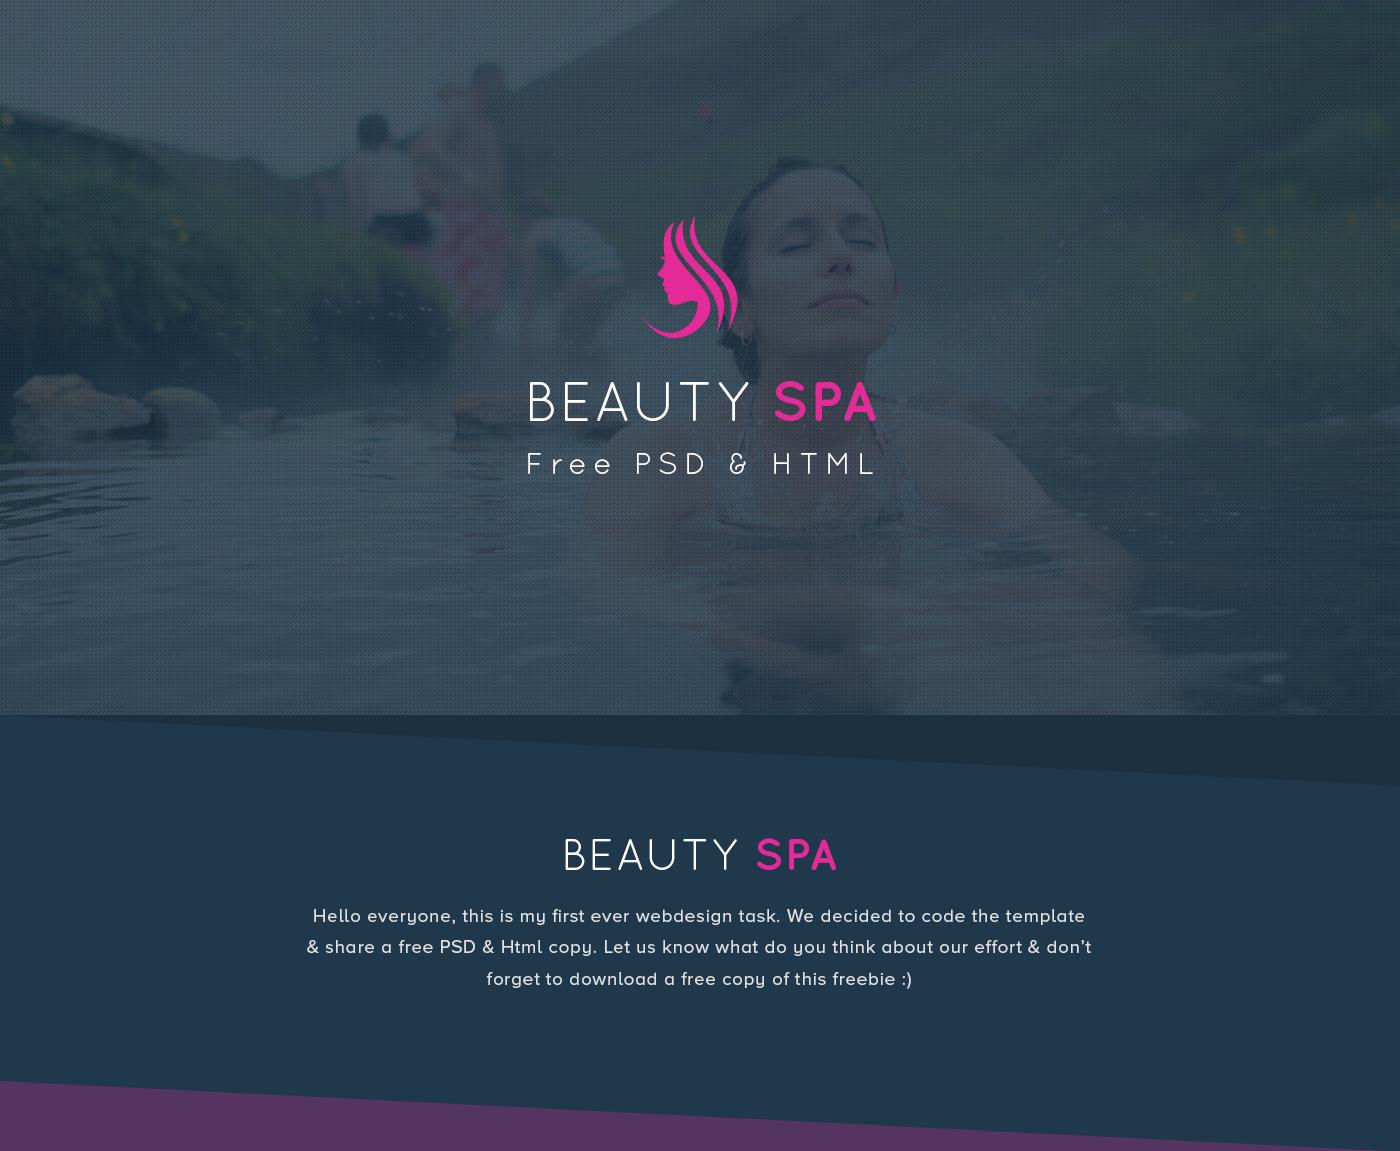 Spa salon landing page Website design free HTML freebie free download free psd